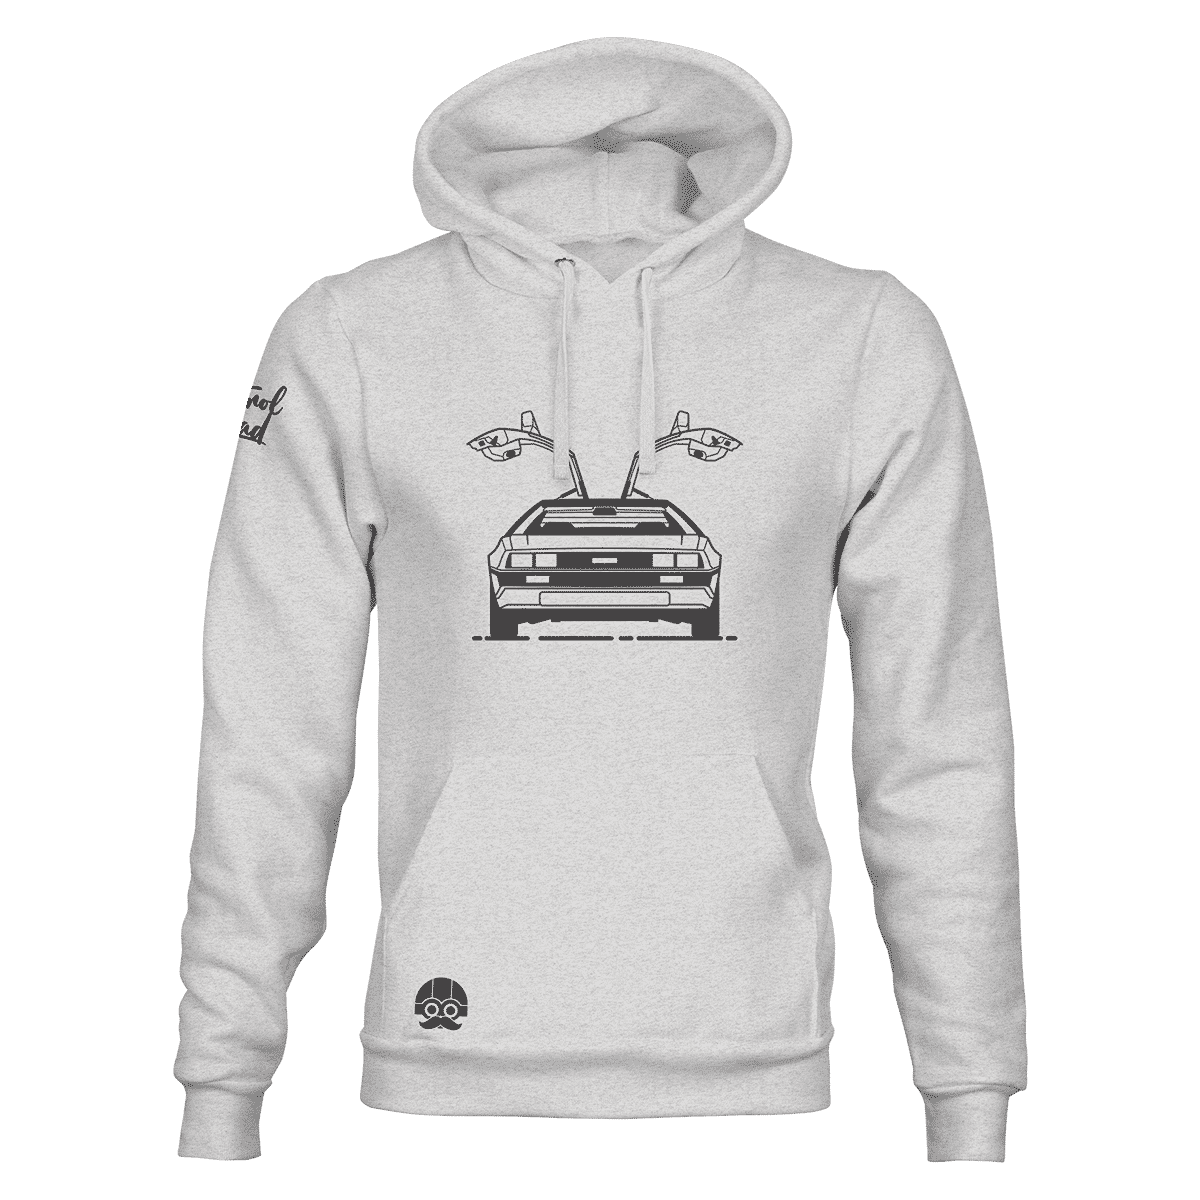 Bluza męska kangurka z DeLorean'em